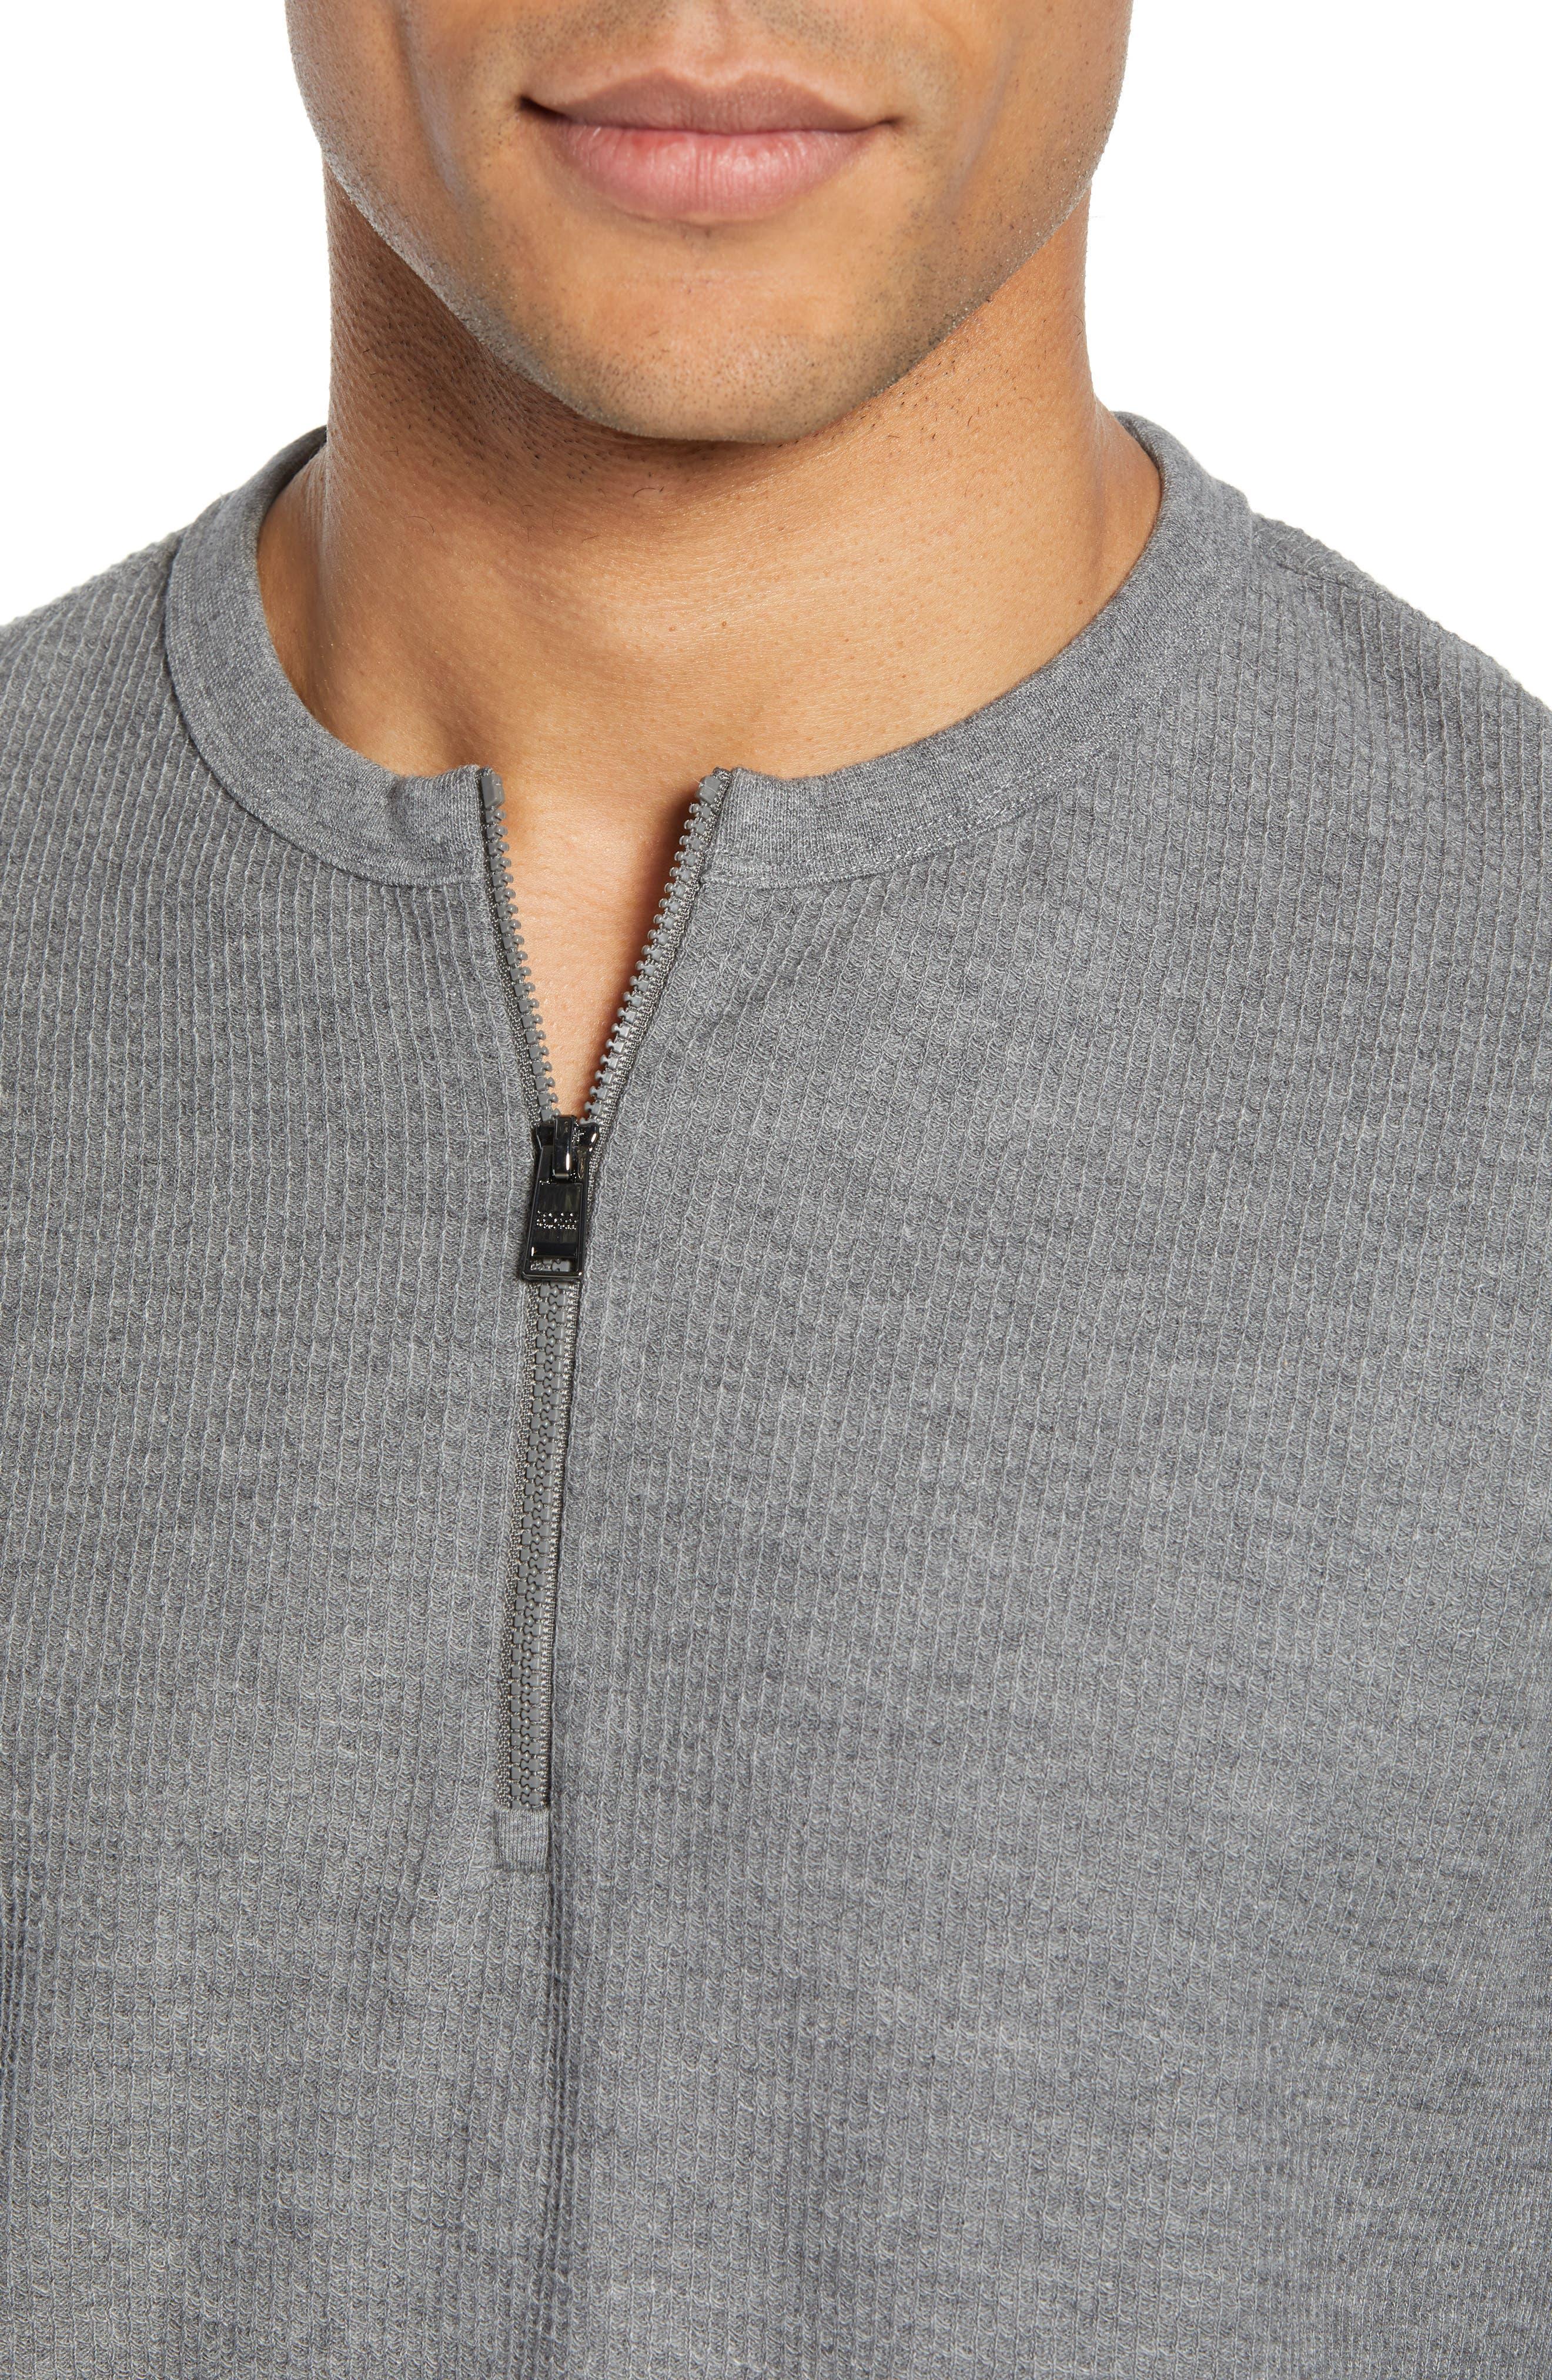 Textor Quarter Zip Thermal T-Shirt,                             Alternate thumbnail 4, color,                             GREY